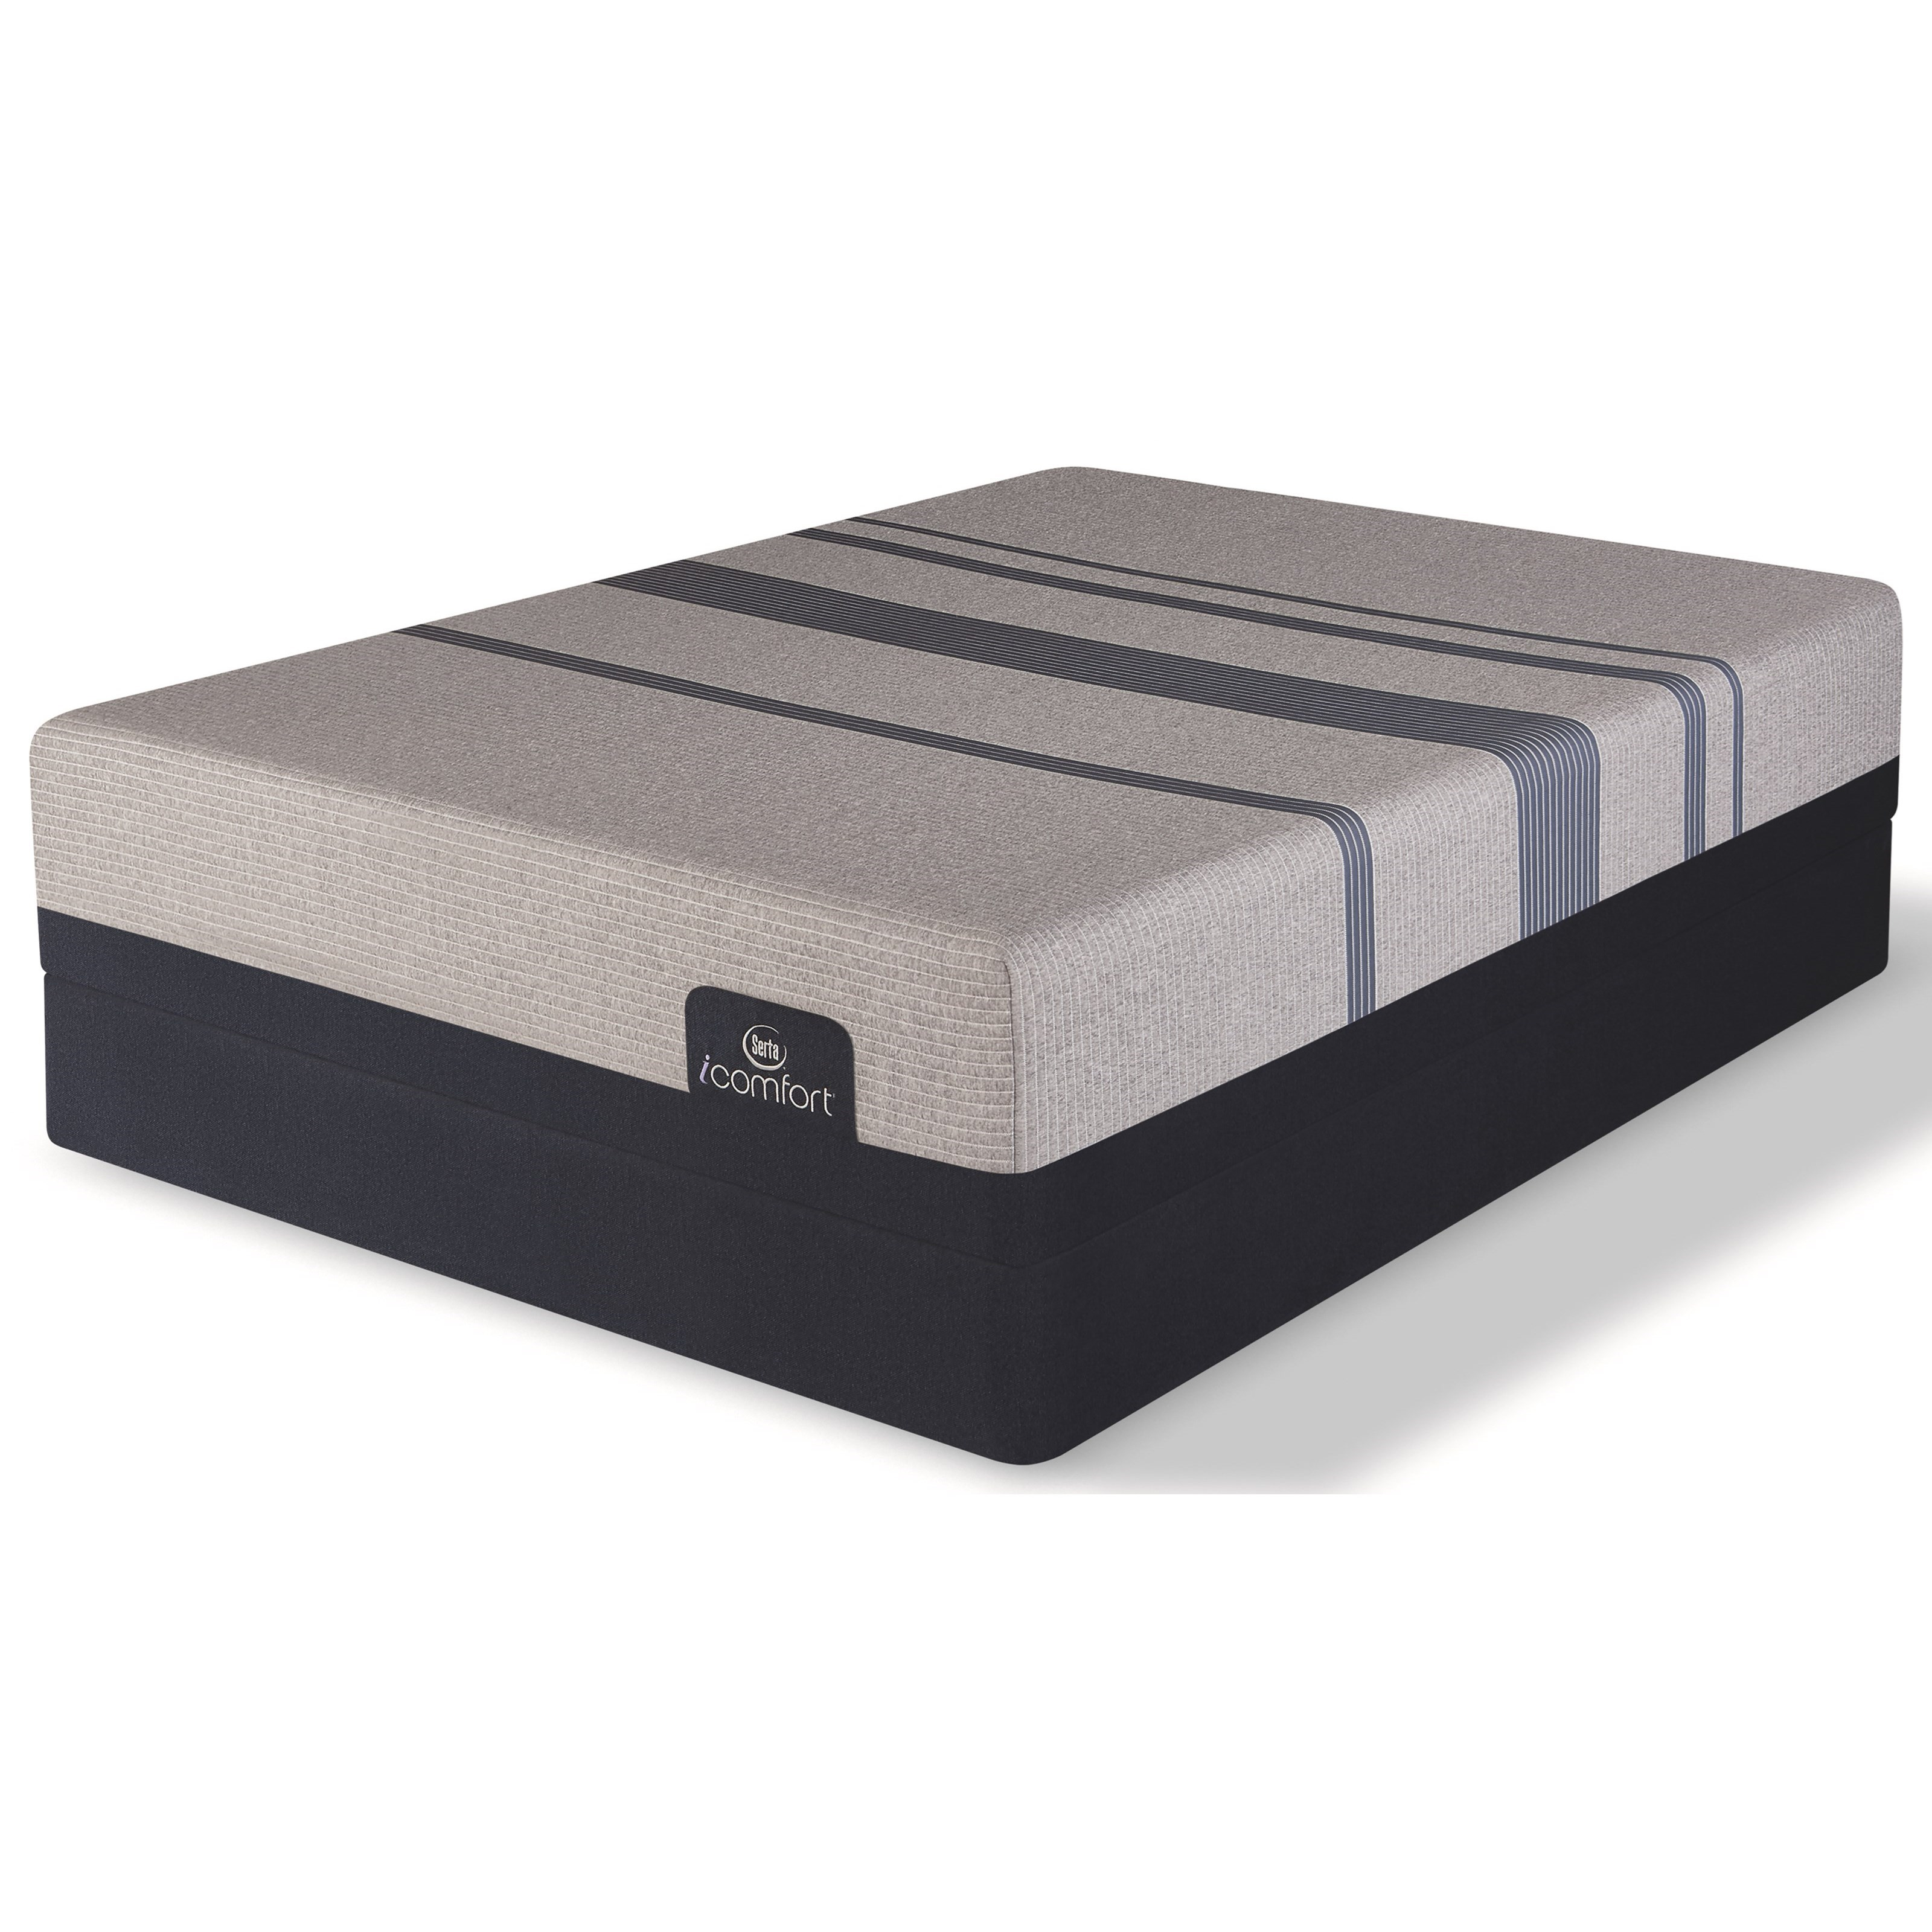 Serta iComfort Blue Max 1000 Plush Twin XL Plush Gel Memory Foam Reg Set - Item Number: 500801368-1020+500117499-5020